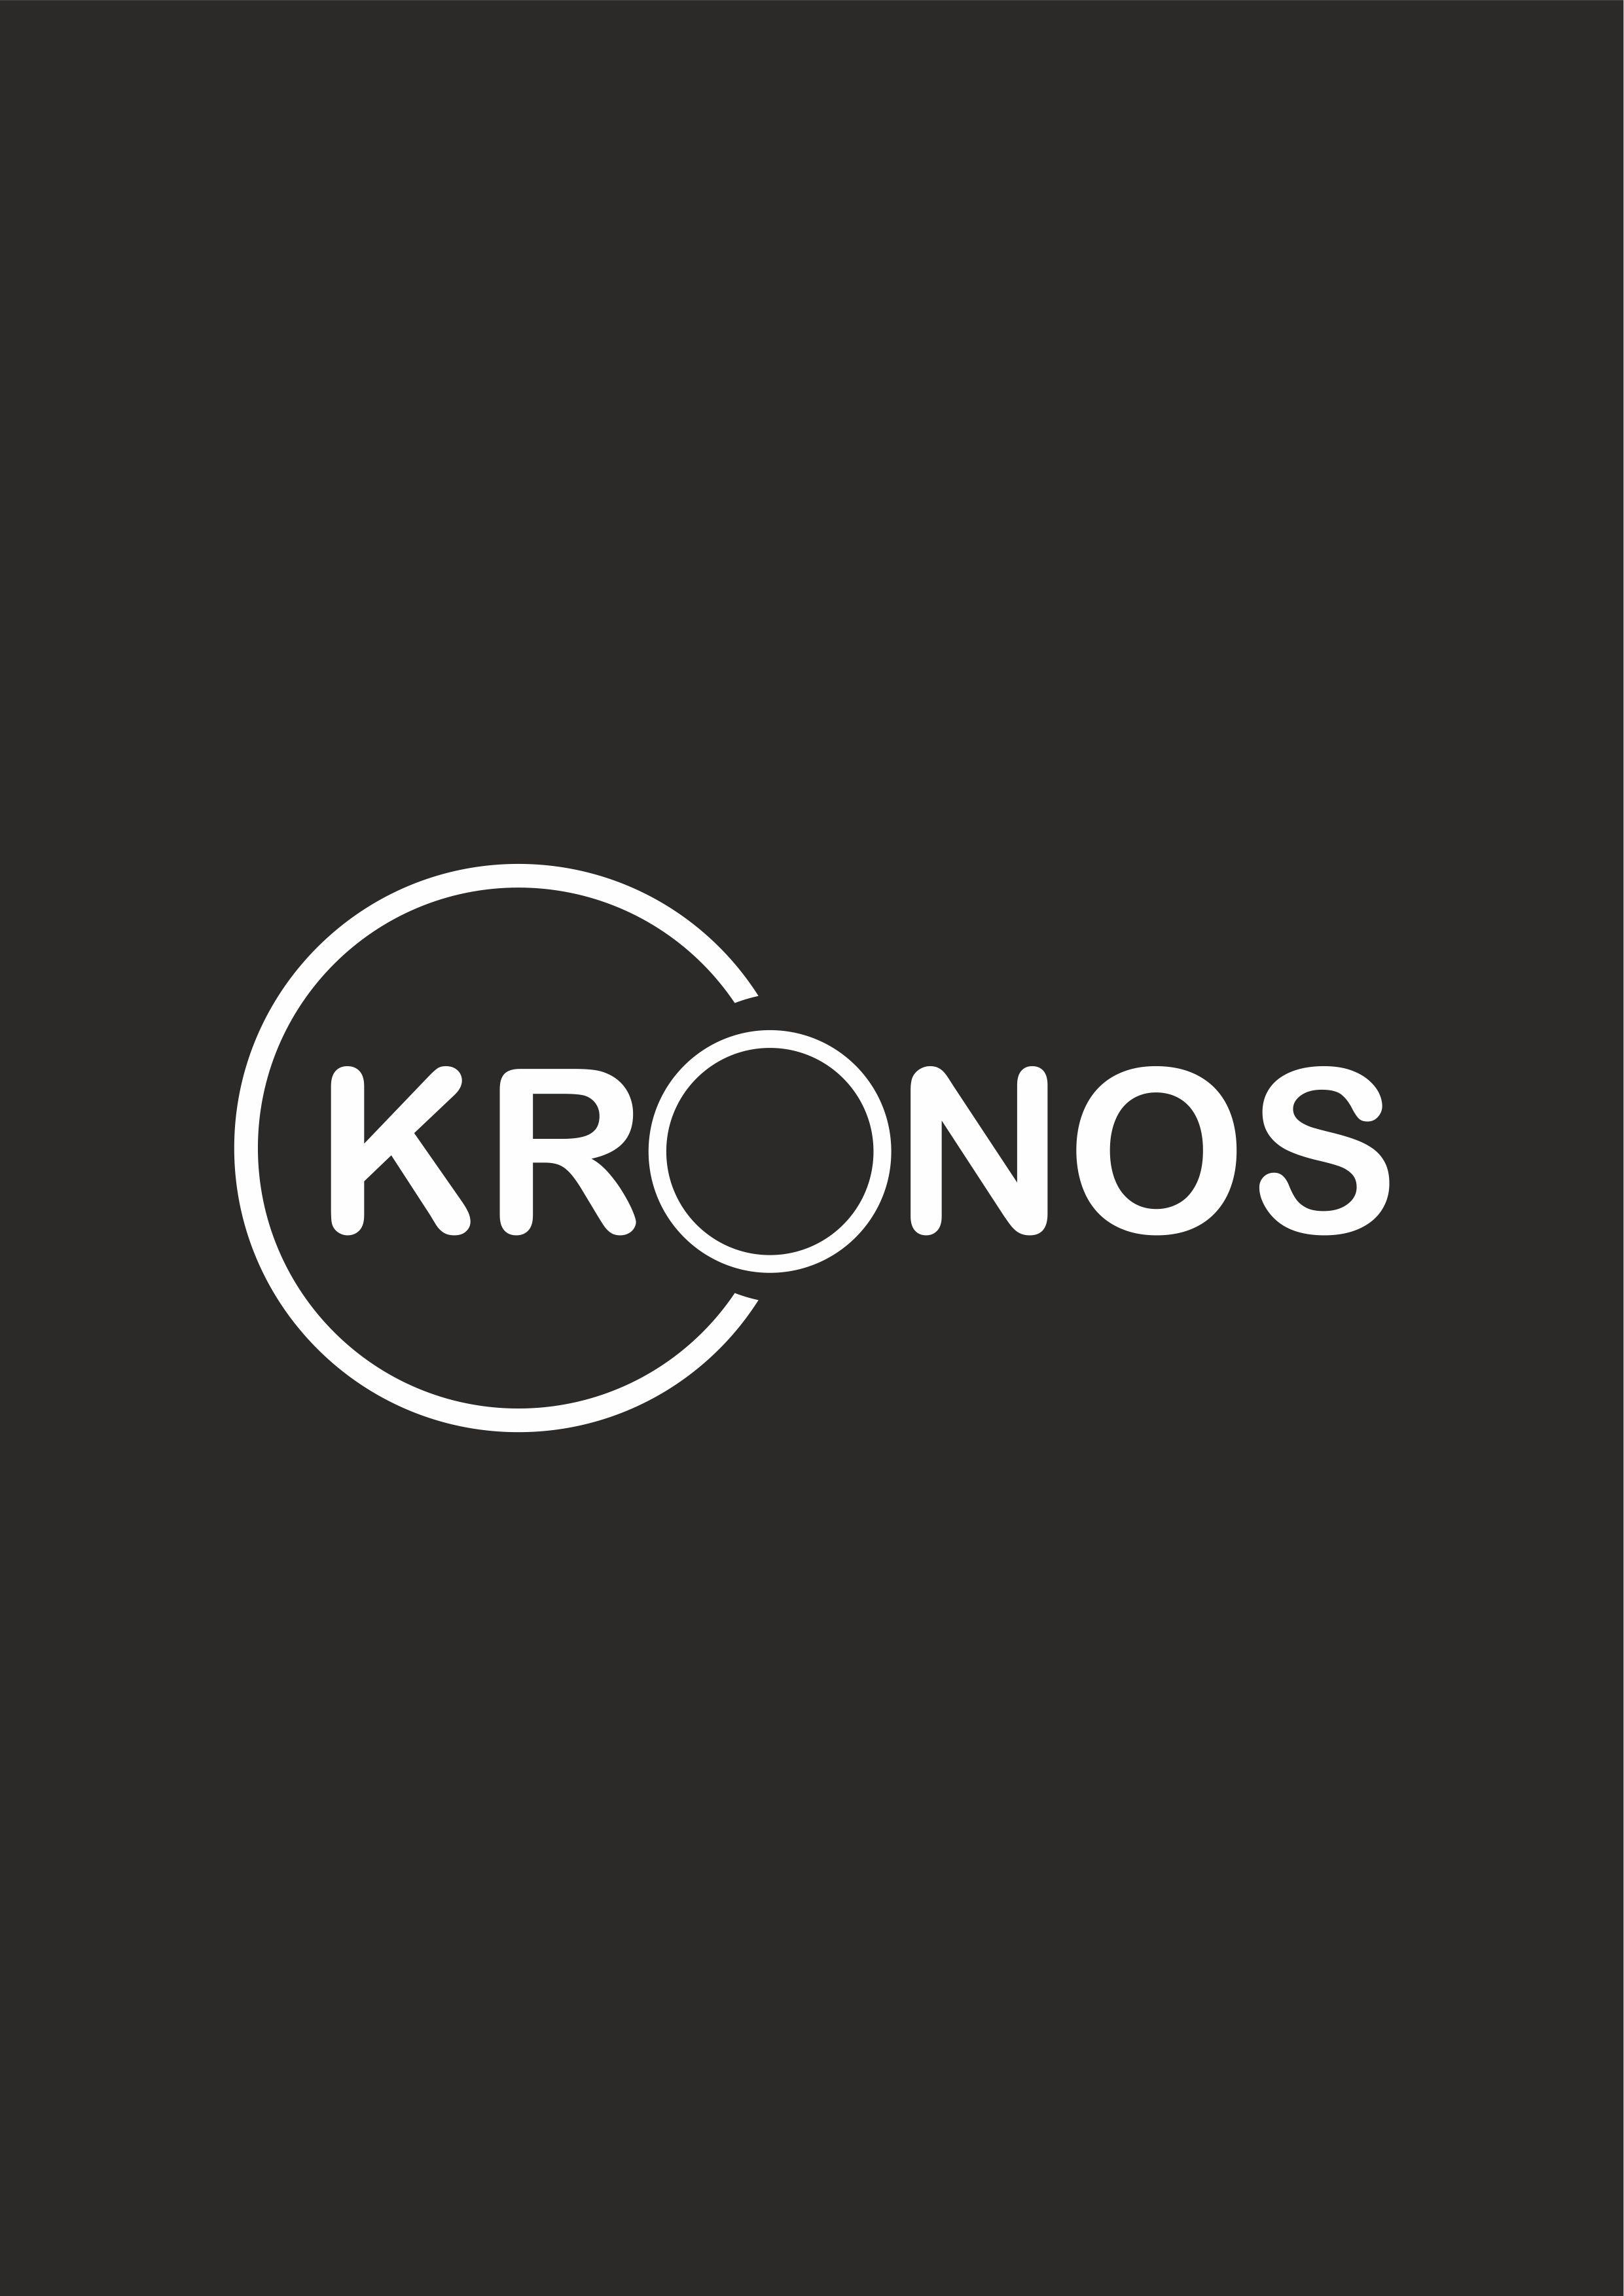 Разработать логотип KRONOS фото f_7655fb07d0f6e0f0.jpg